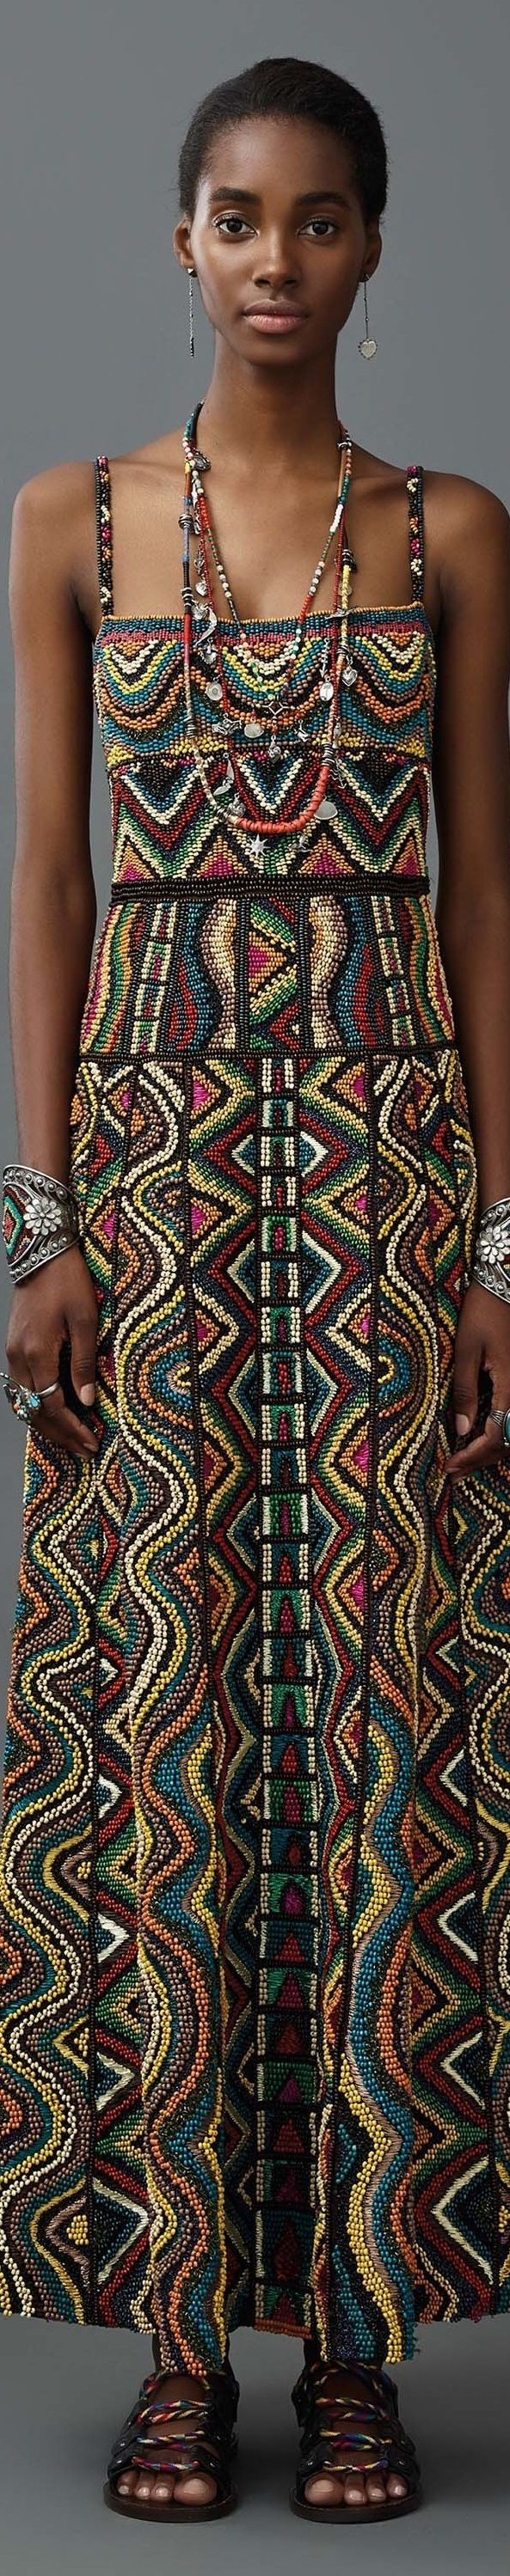 Valentino resort 2017 -- See more beaded fabrics here: www.bandjfabrics.com/search/node/bead